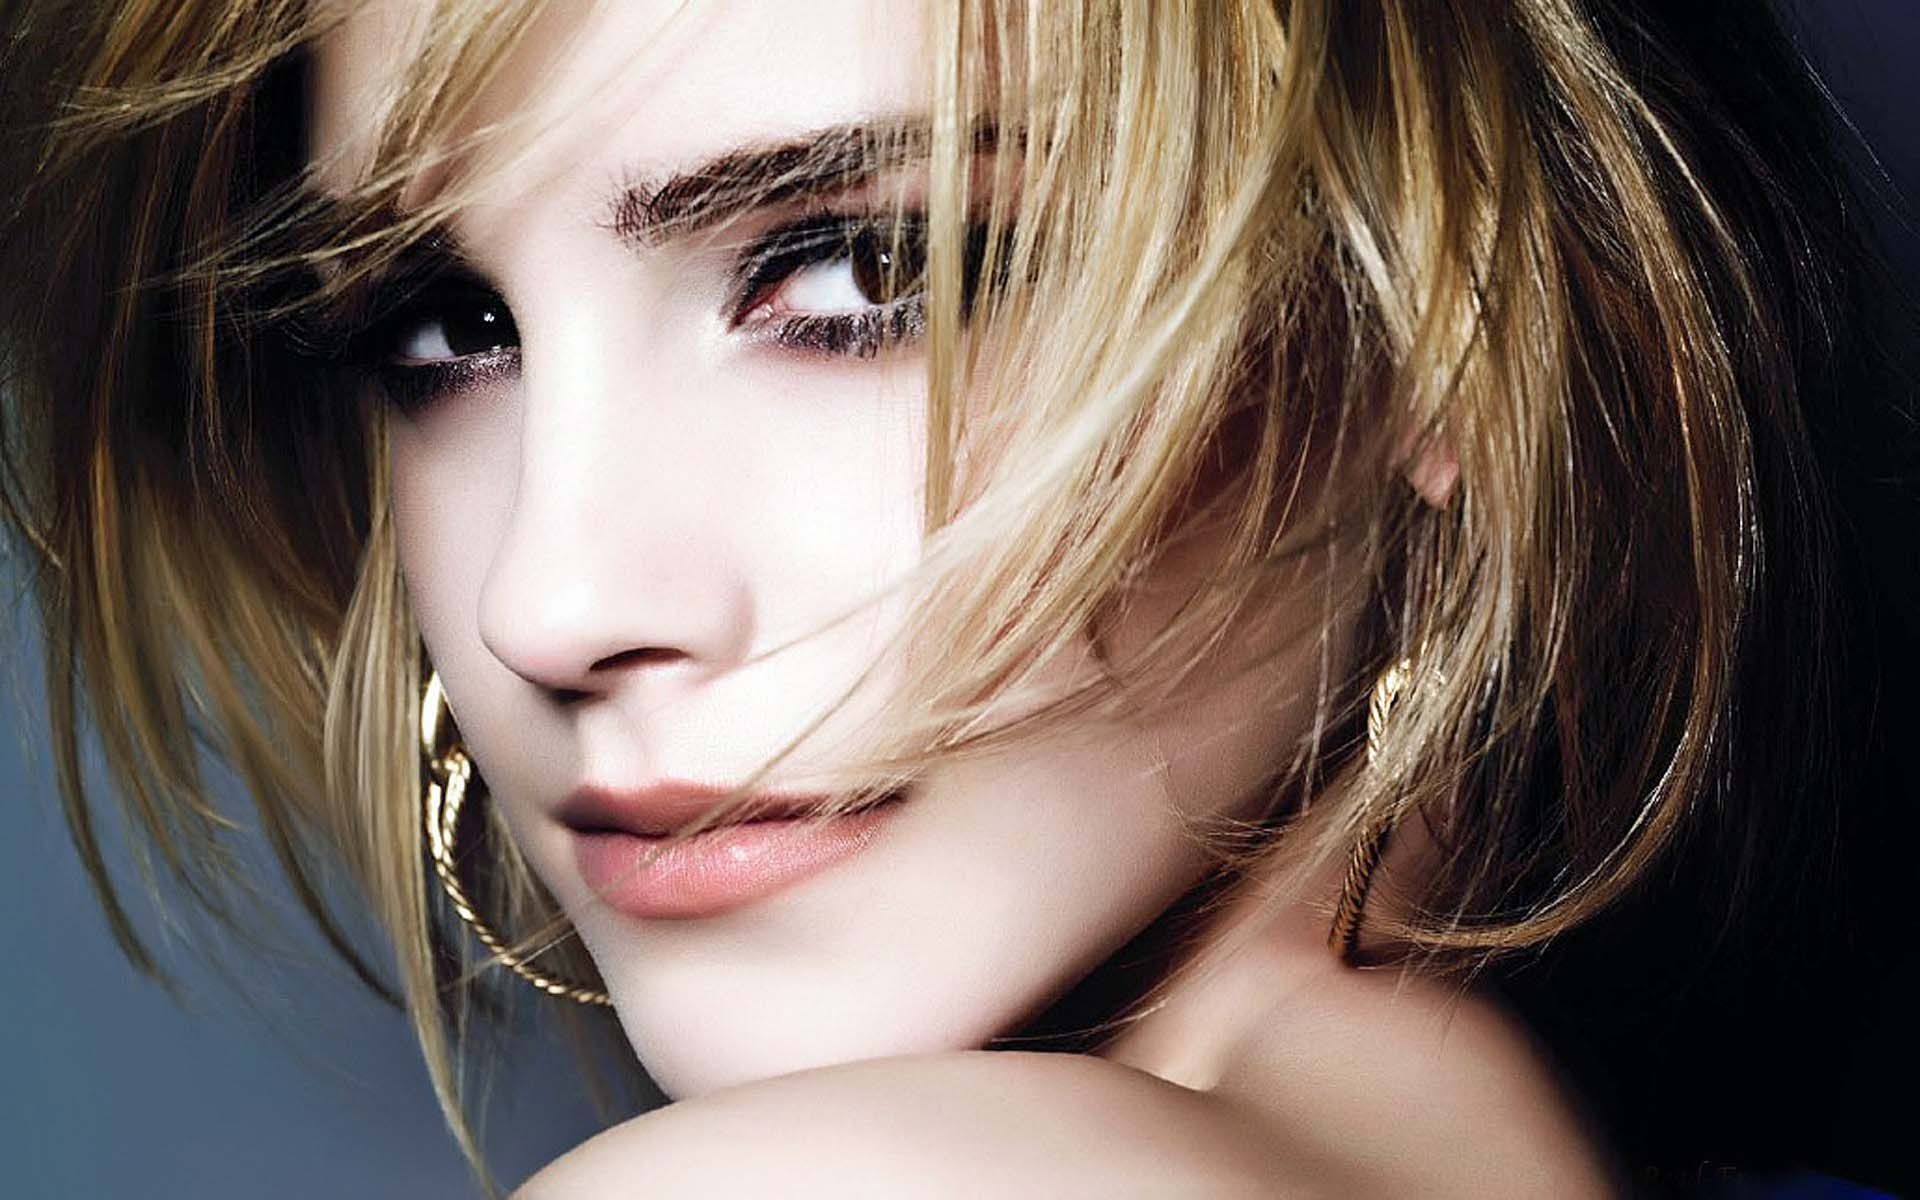 Hd wallpaper emma watson - Emma Watson Hd Images Free Download Latest Emma Watson Hd Images For Computer Mobile